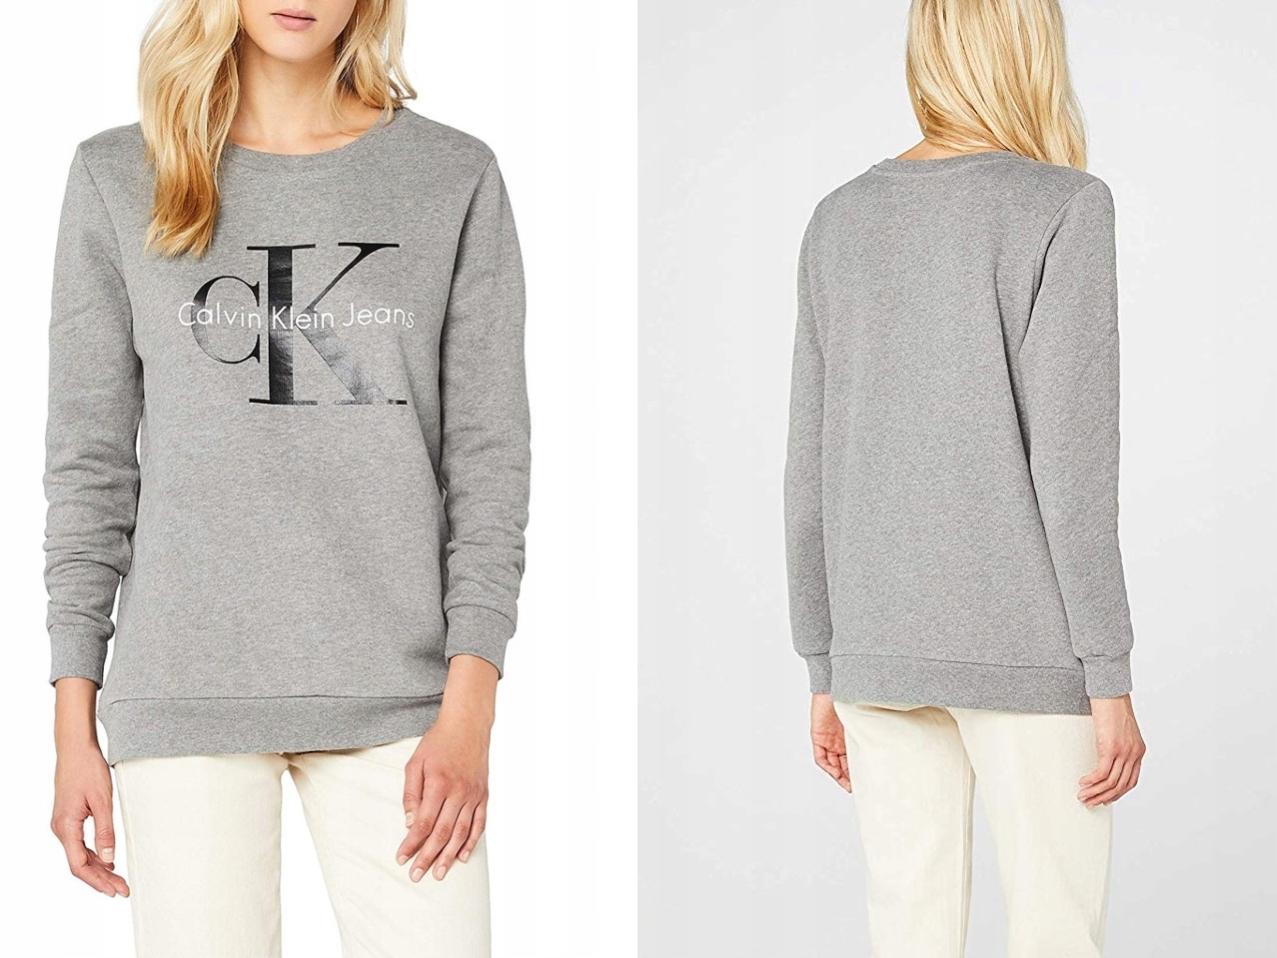 Calvin Klein Jeans Szara Bluza z Logo L/40